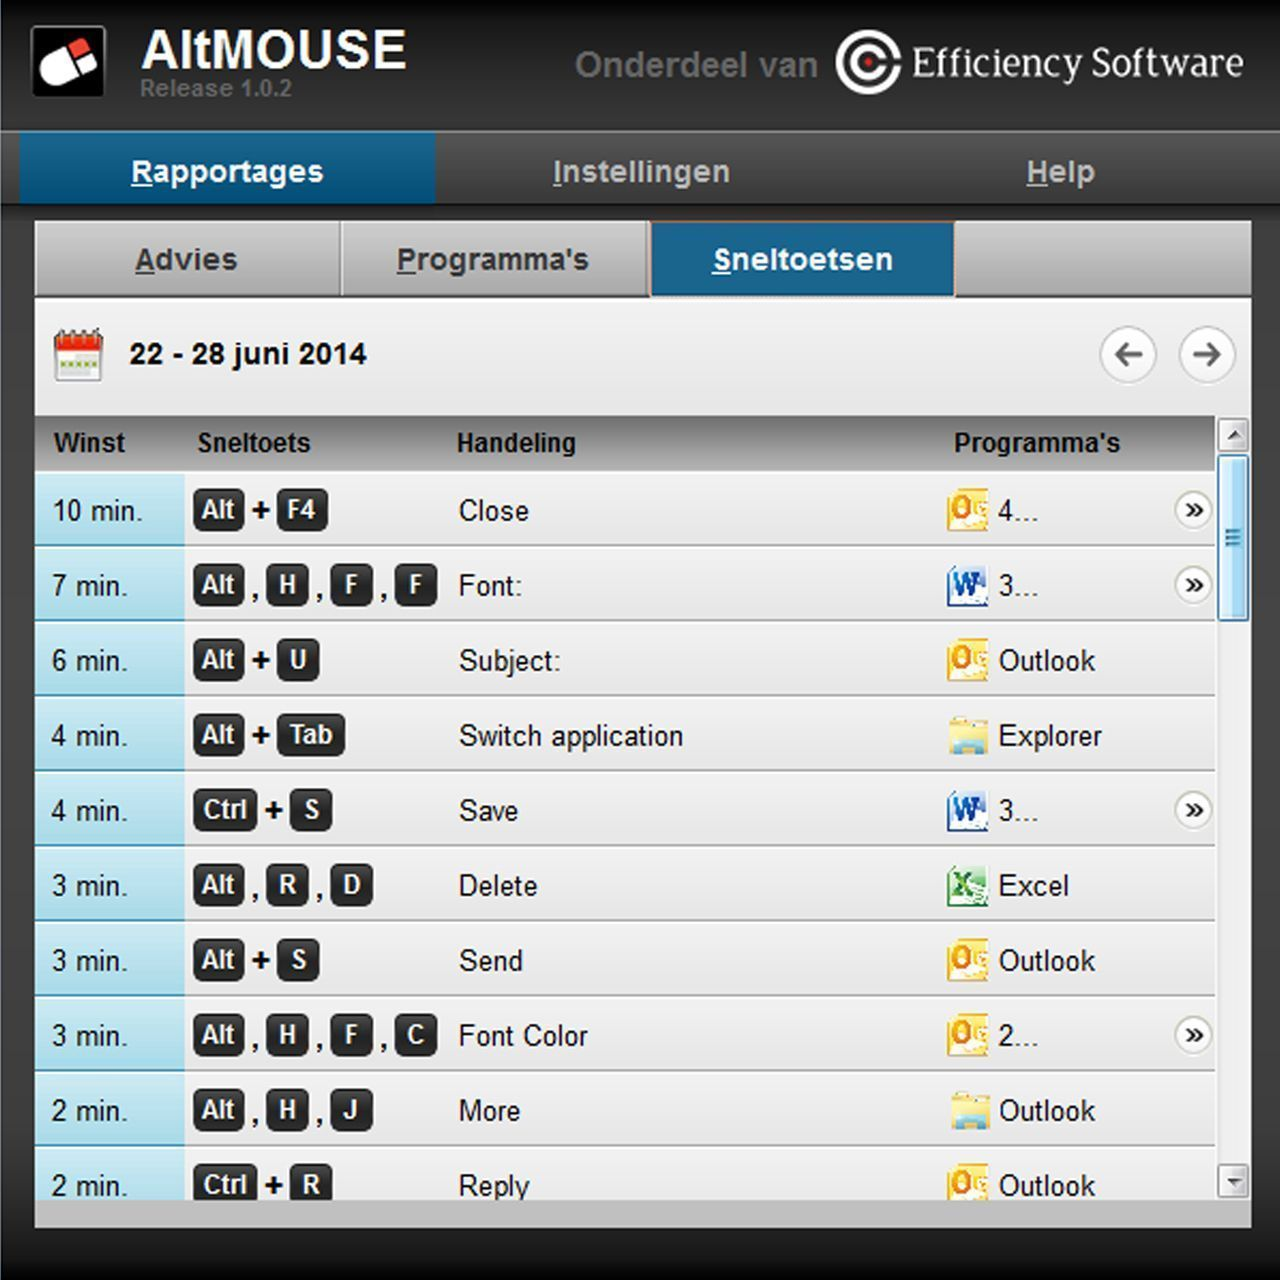 altmouse software arbosoftware ARTNRNNB categorie